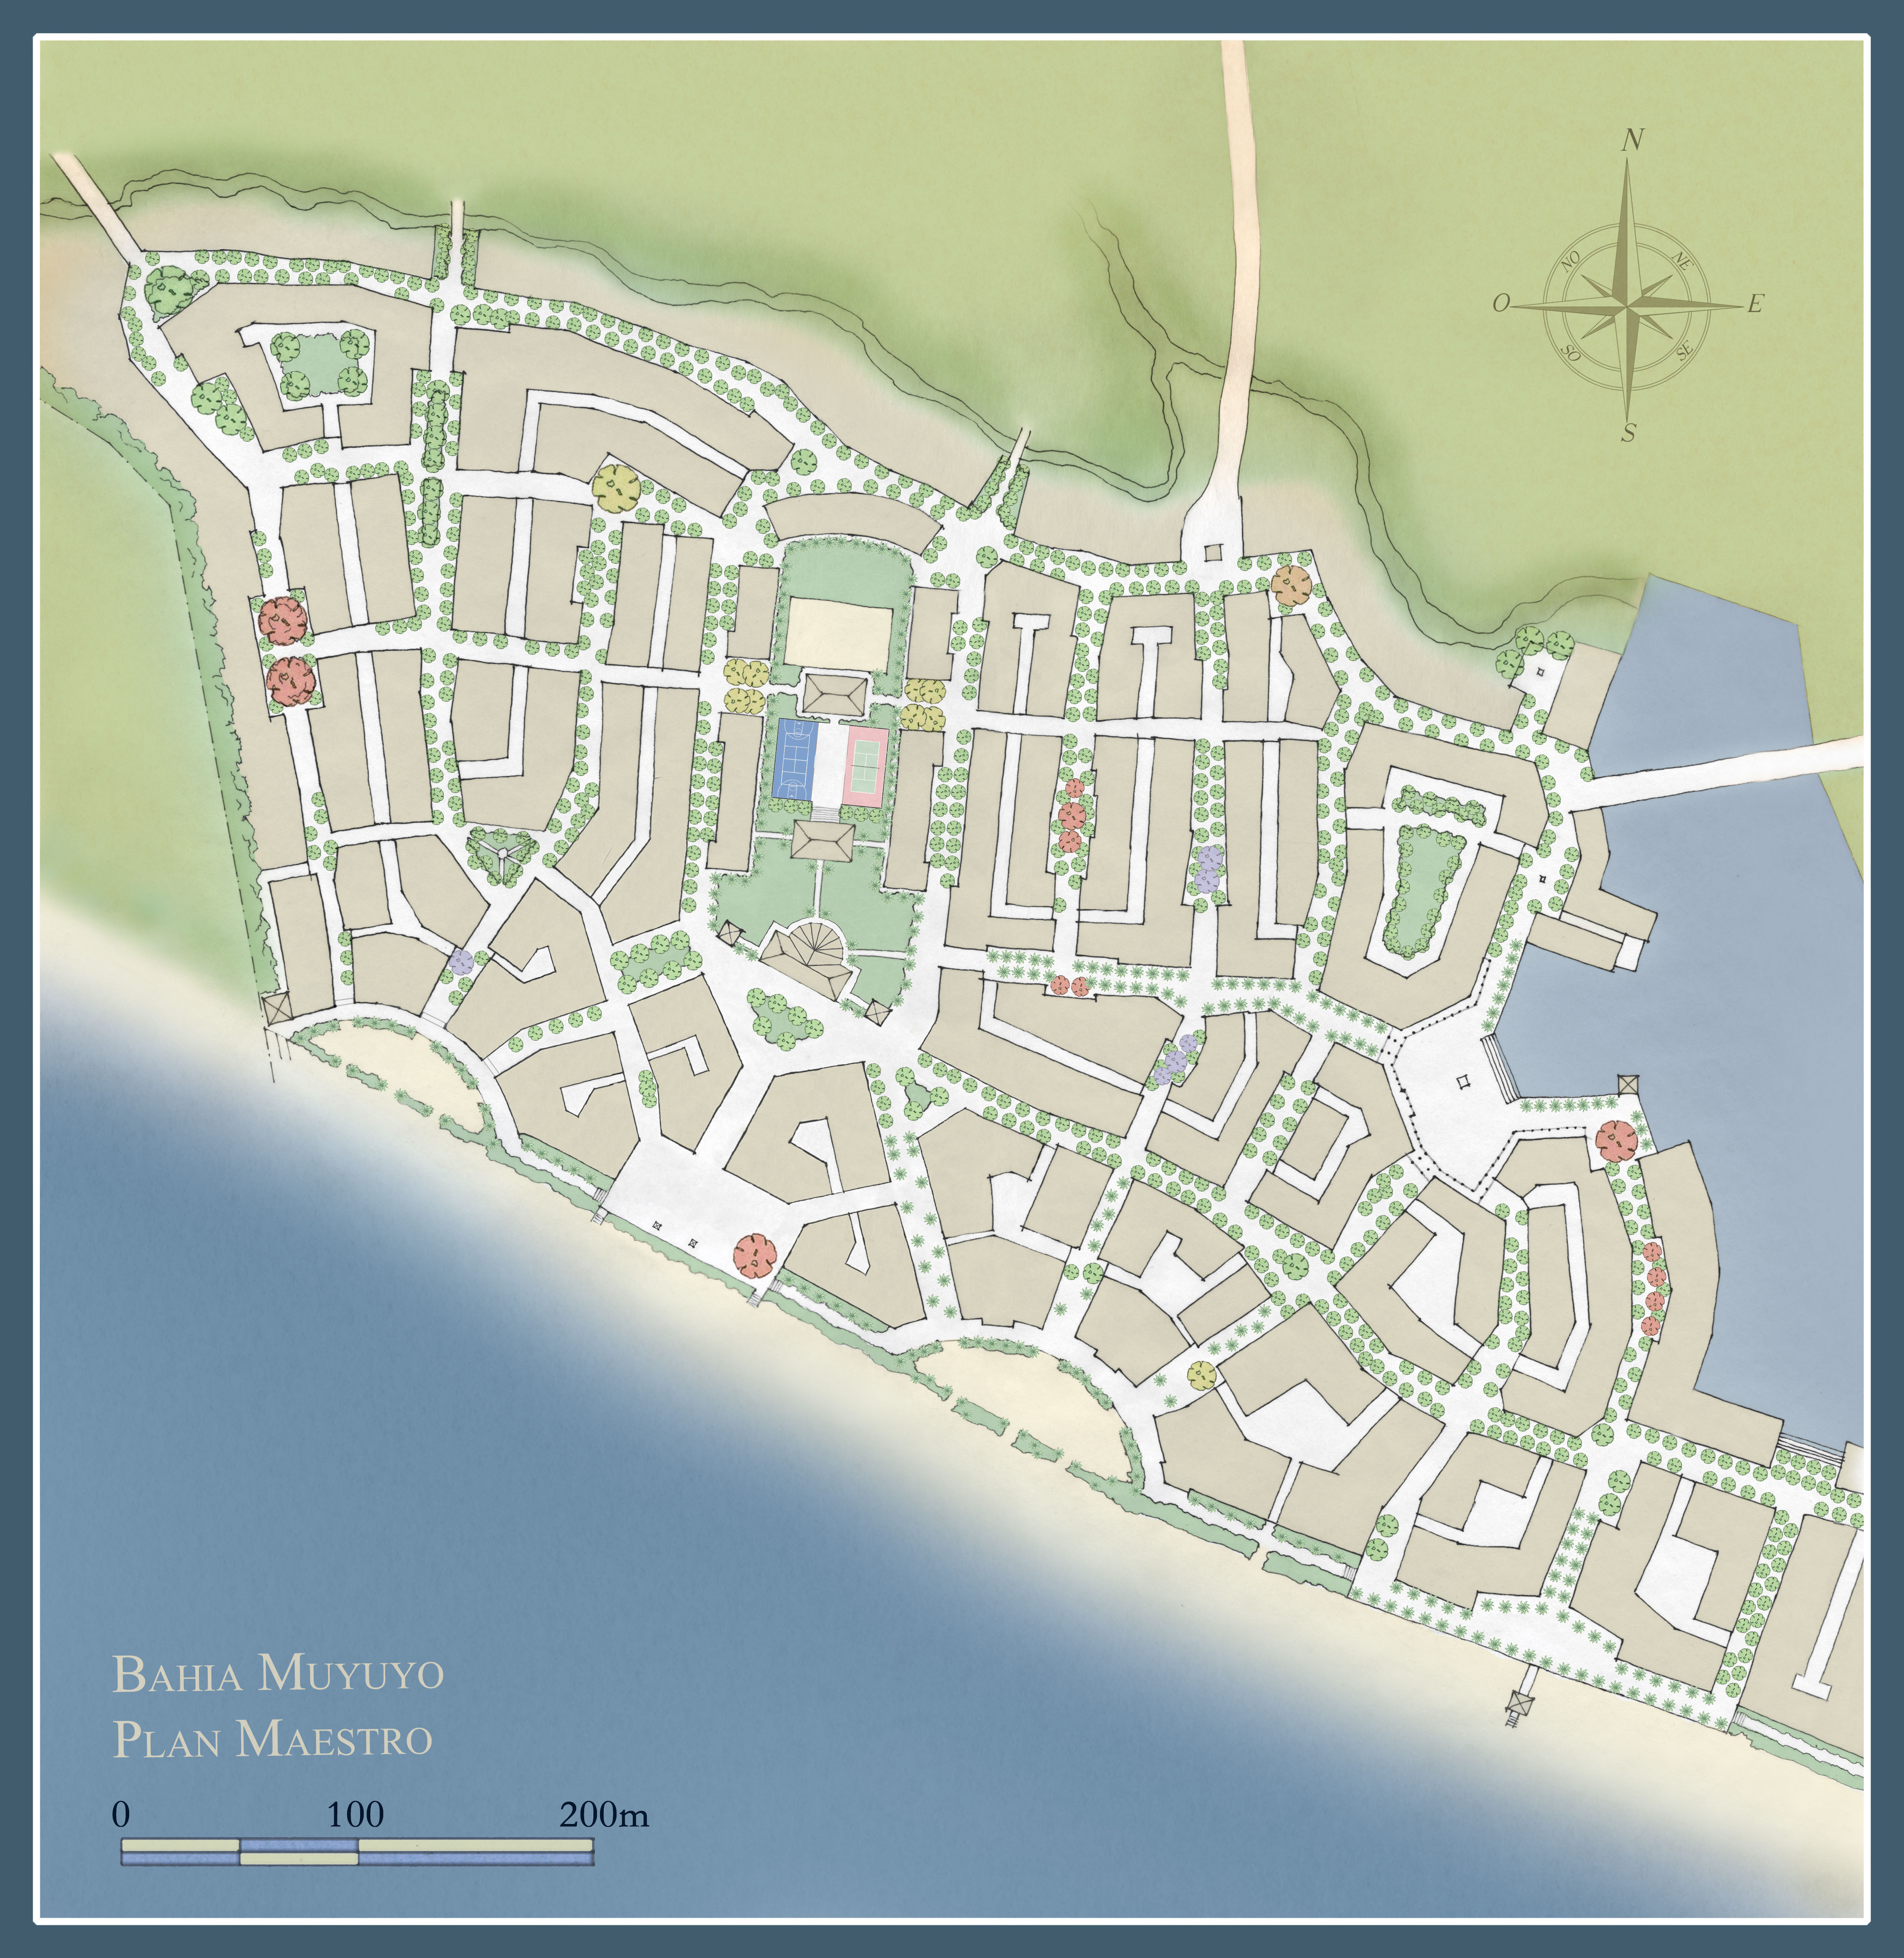 Bahia Muyuyo first beach village